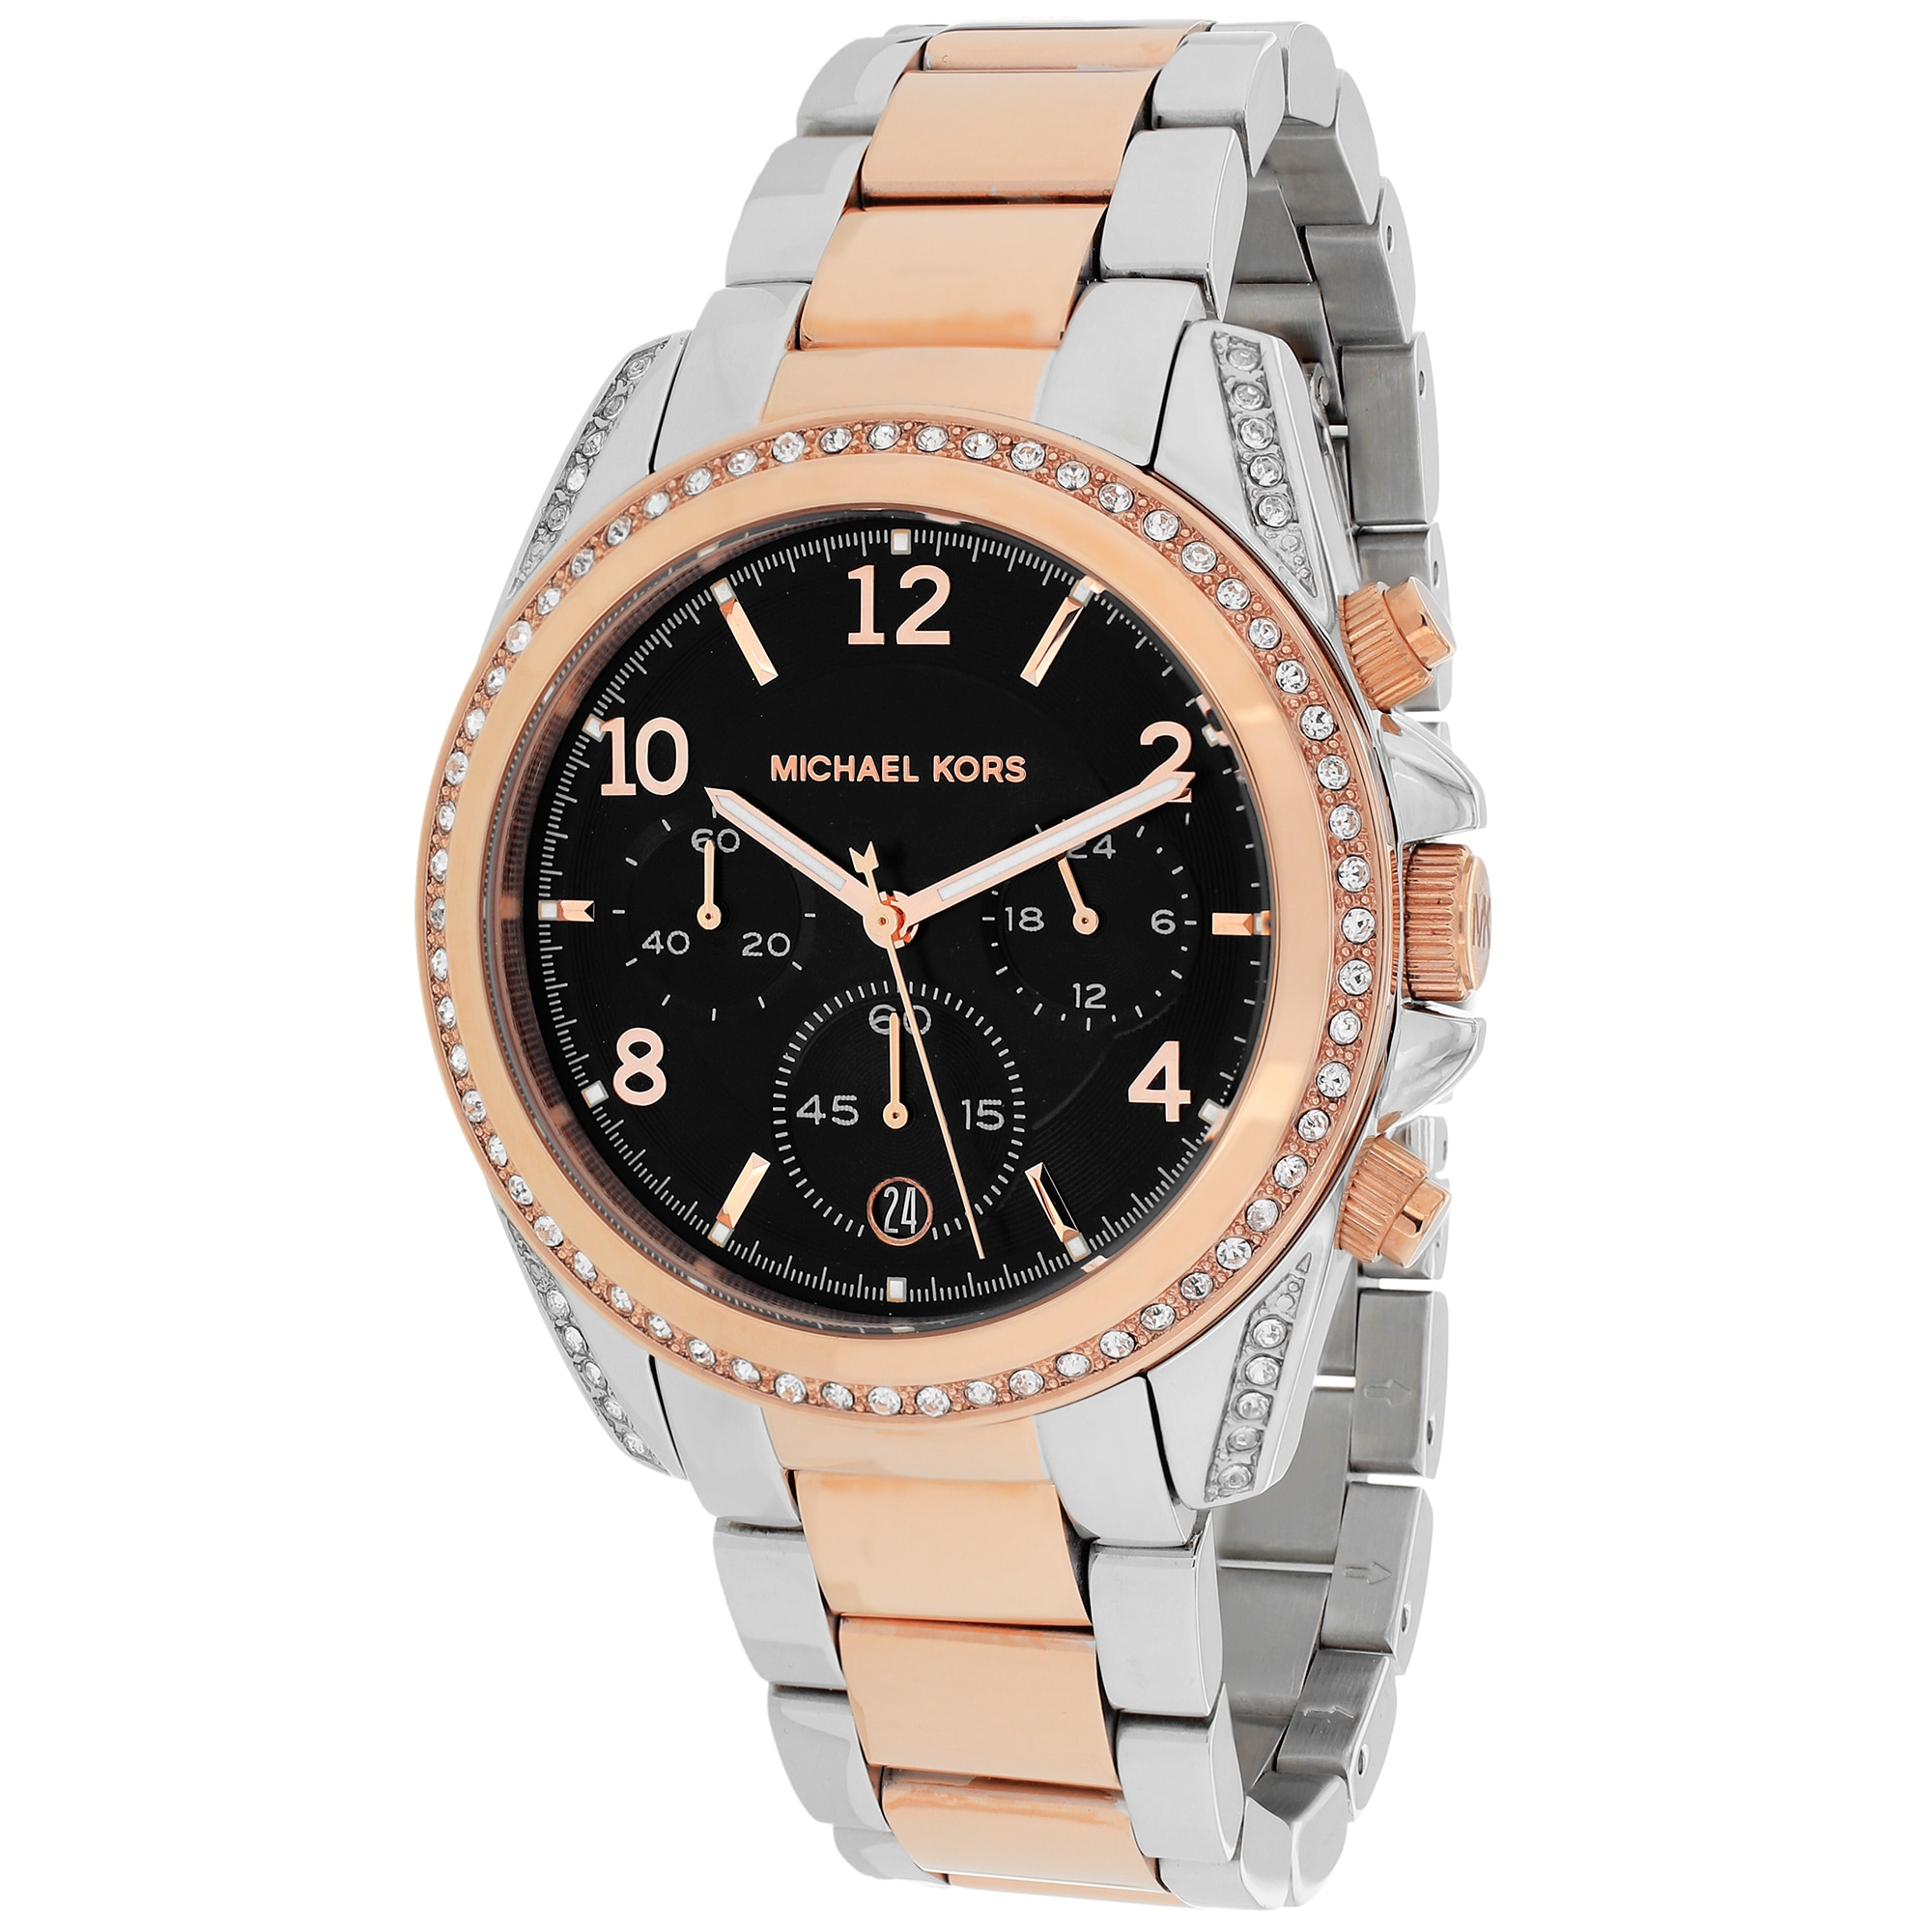 Michael Kors Women's MK6093 'Blair' Chronograph Black Dial Two Tone Stainless Steel Watch